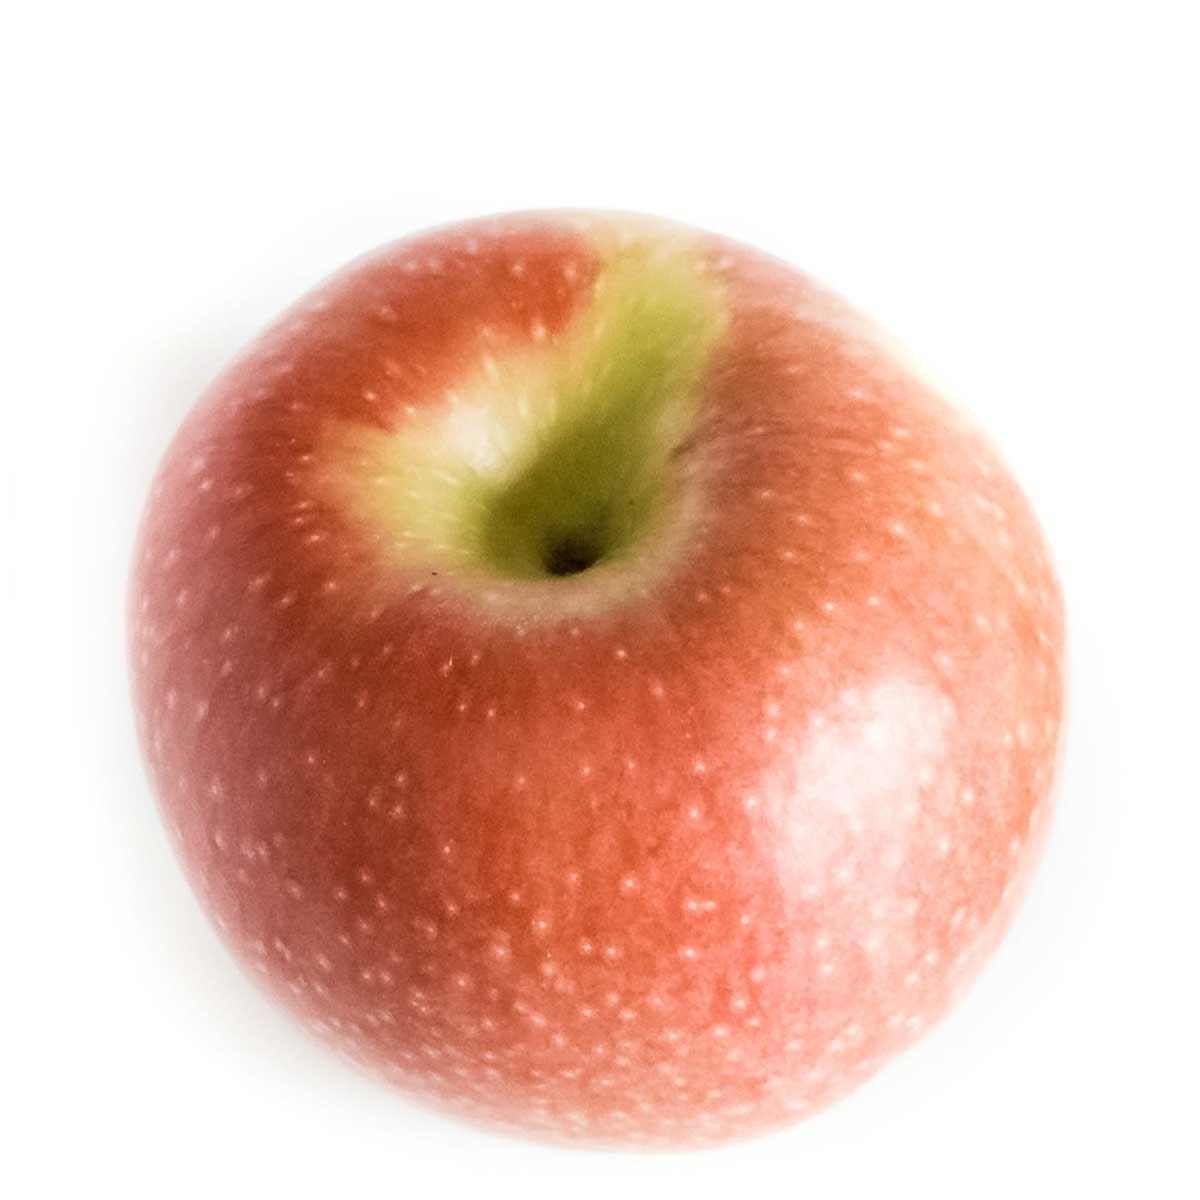 Type of apple: Jonagold